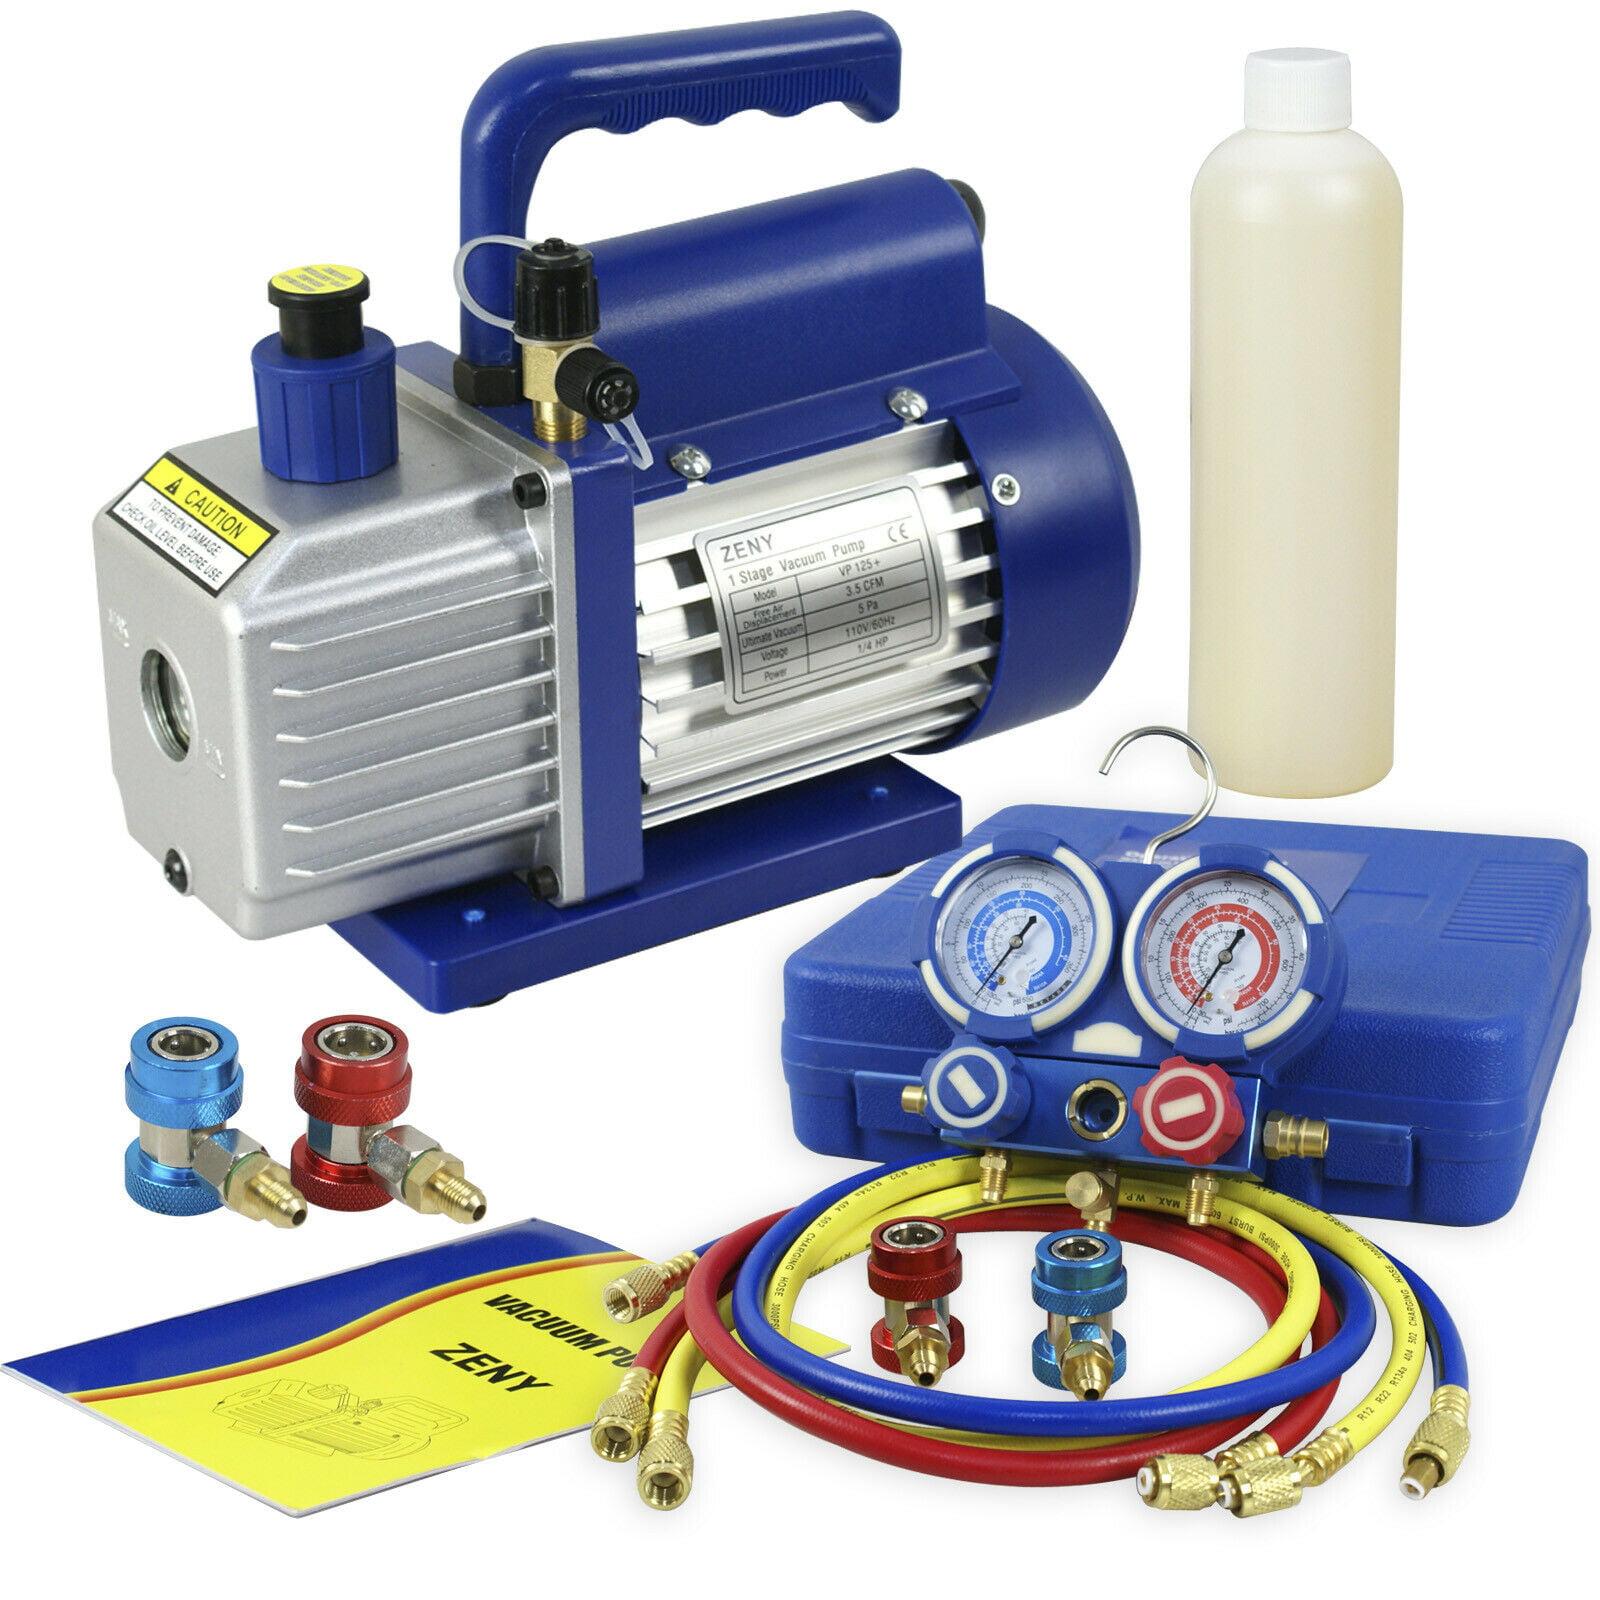 Zeny 3 5cfm Single Stage Rotary Vane Vacuum Pump For Hvac